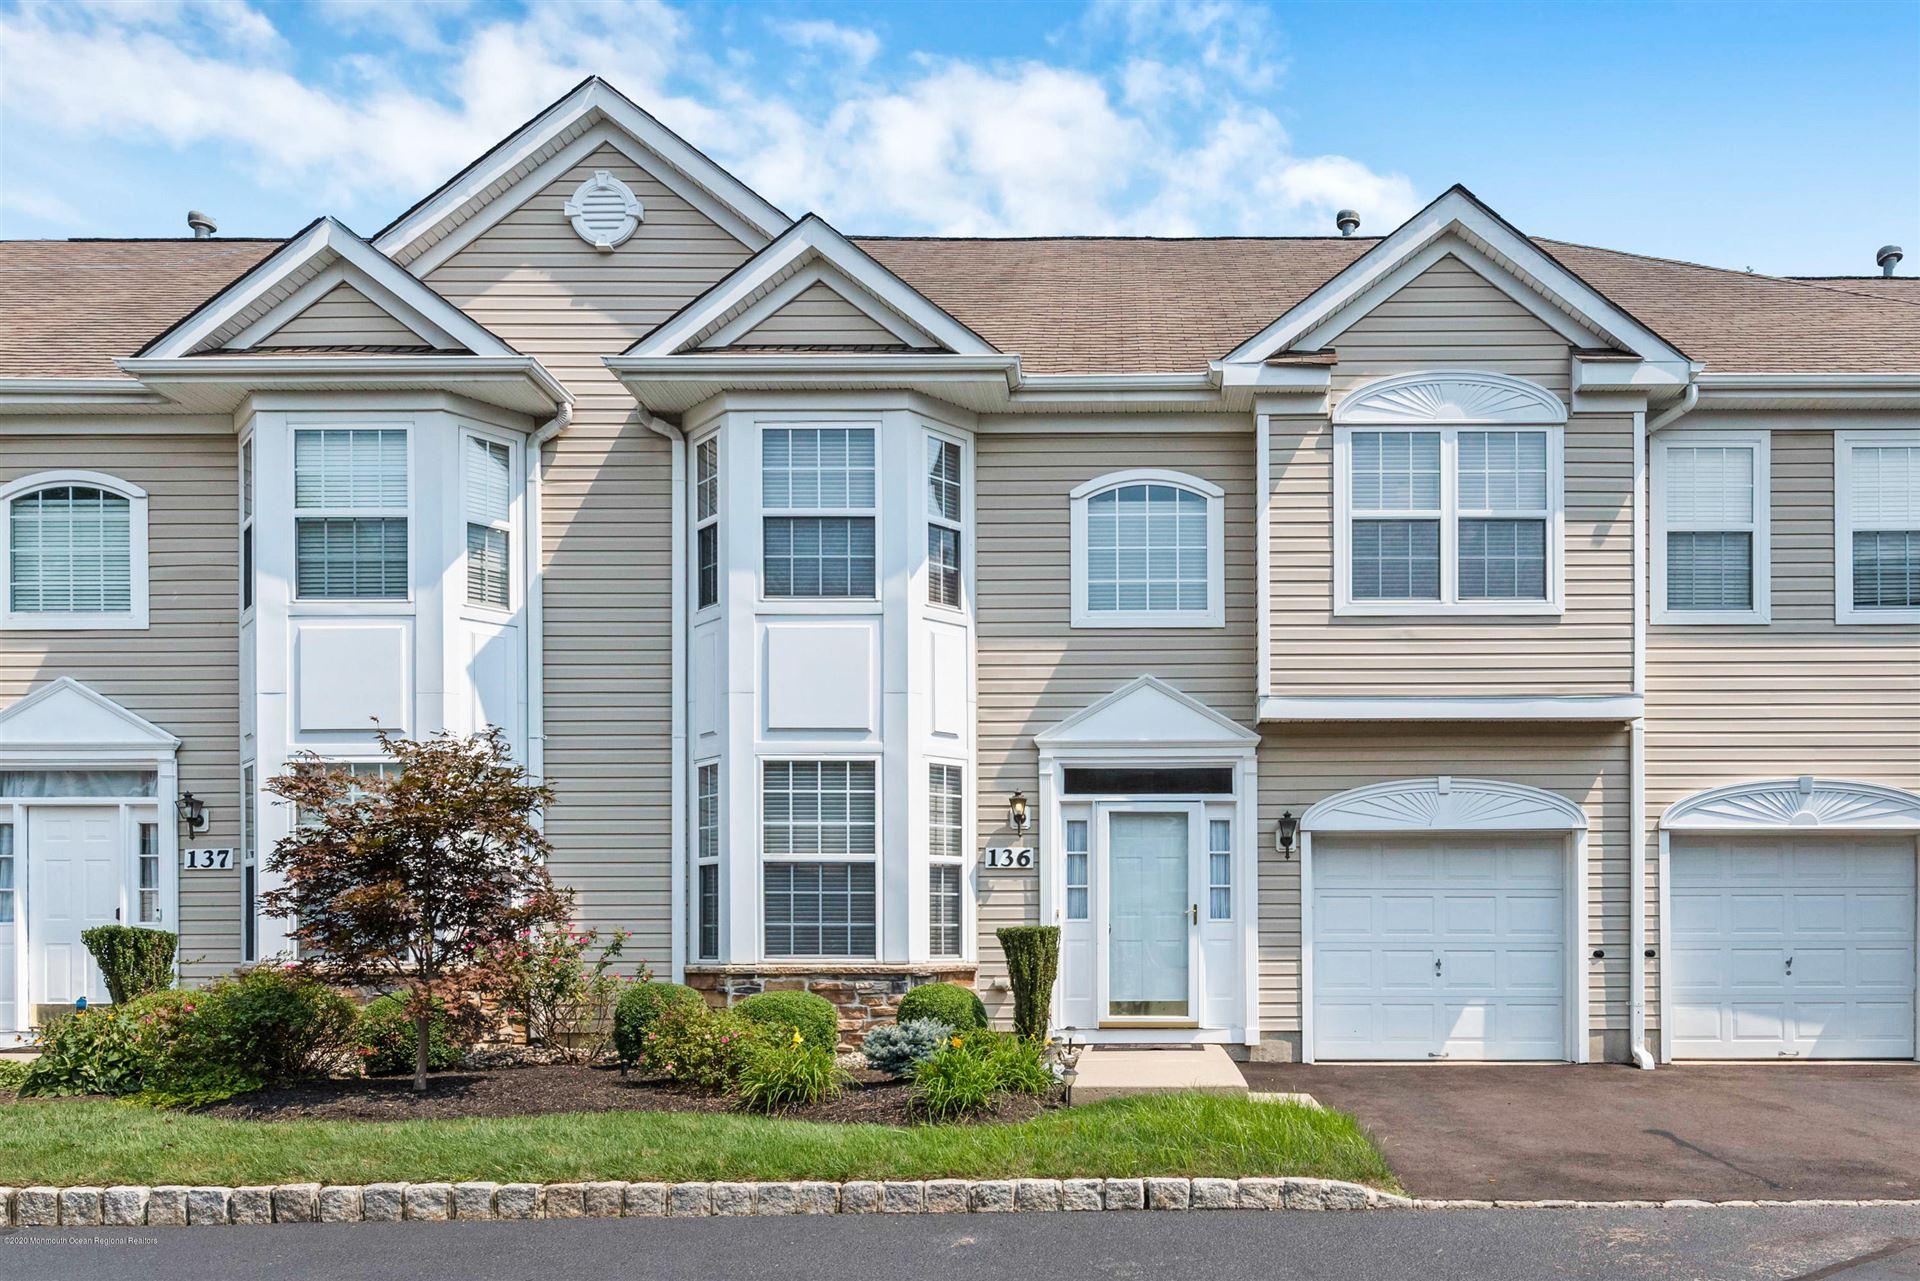 136 Shinnecock Drive, Manalapan, NJ 07726 - MLS#: 22030923